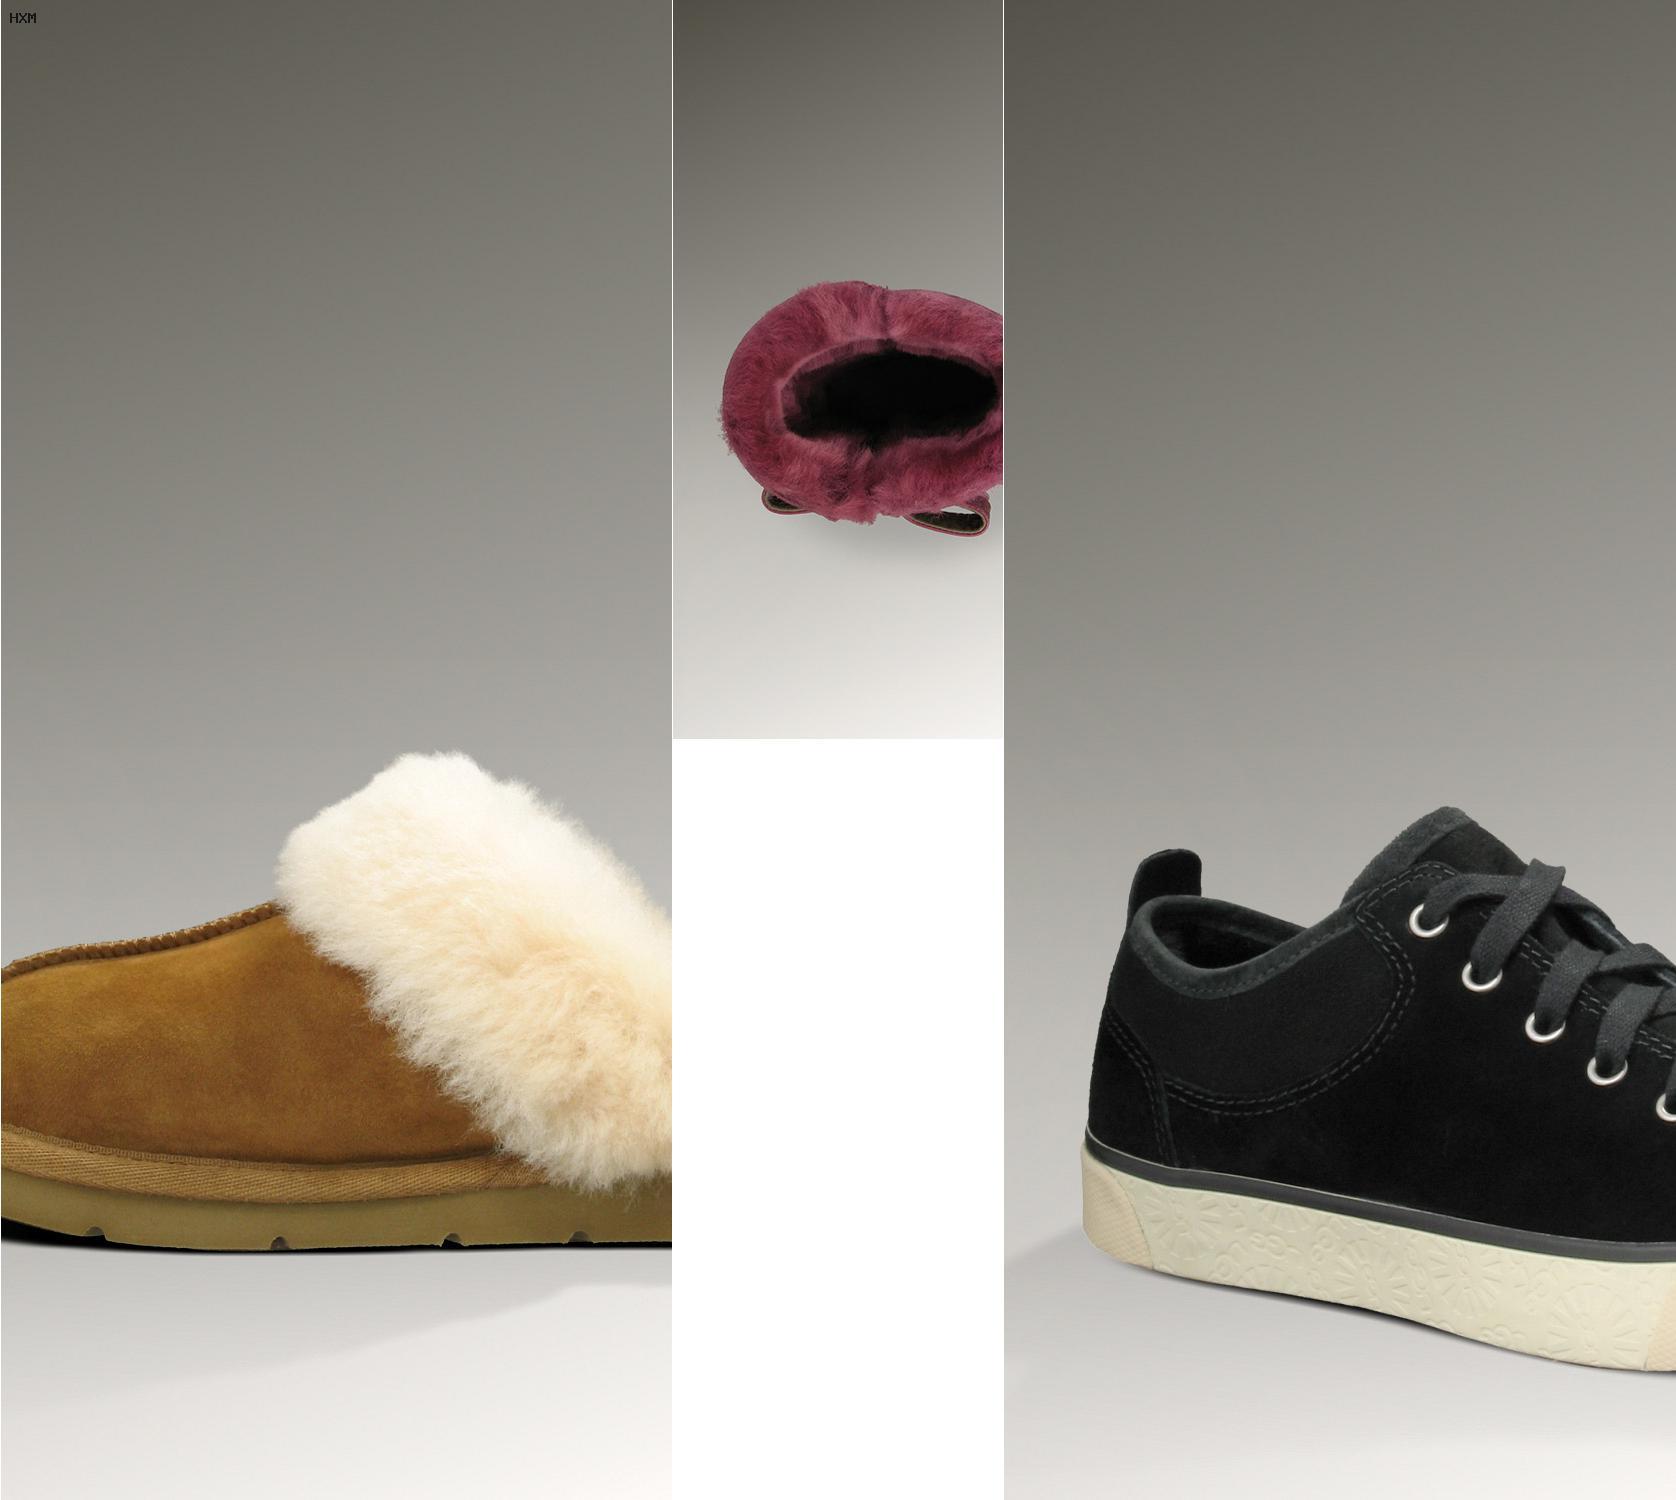 ugg boots prix france